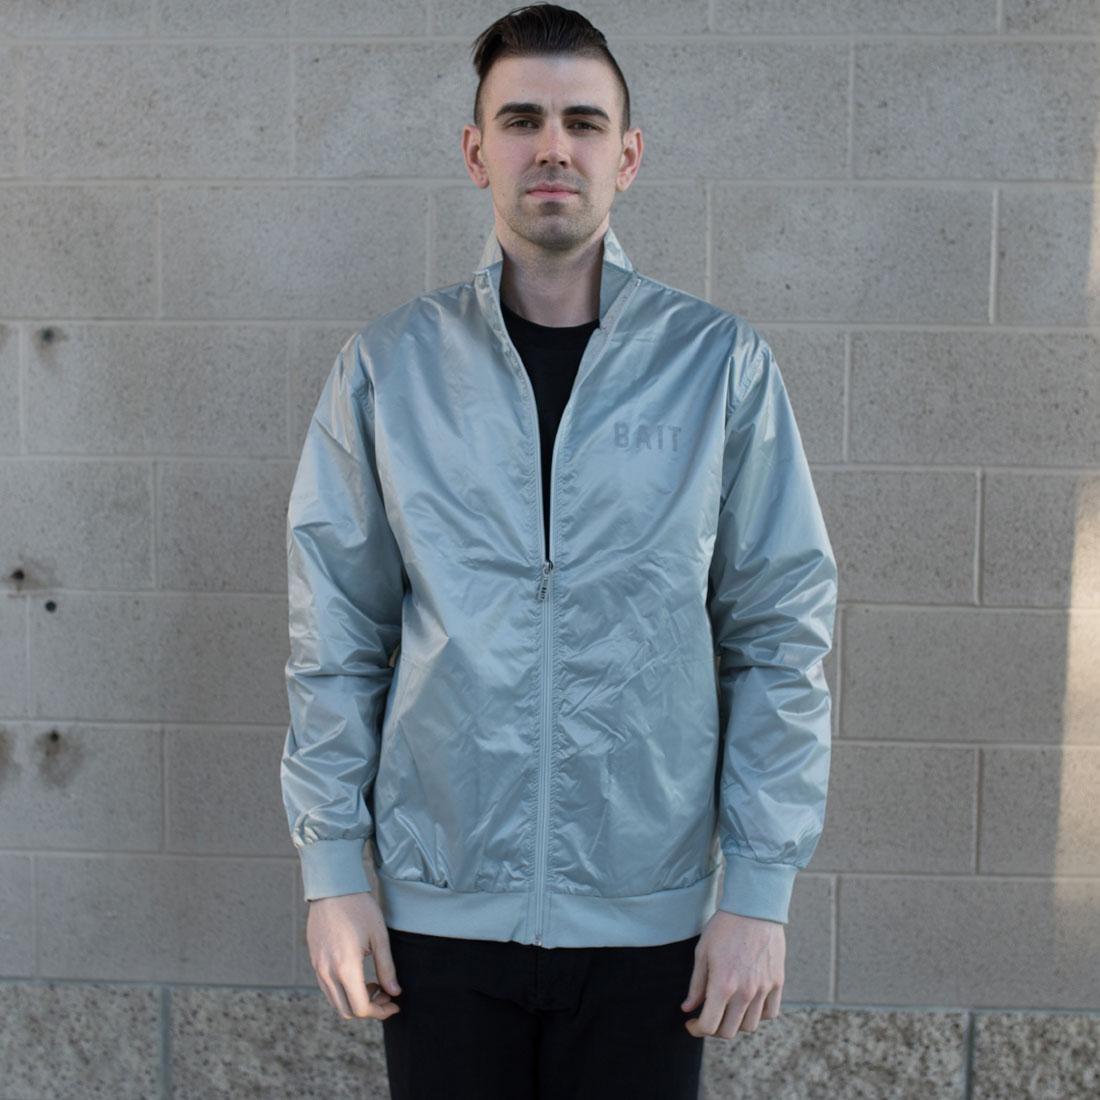 BAIT Nylon Track Jacket (gray)